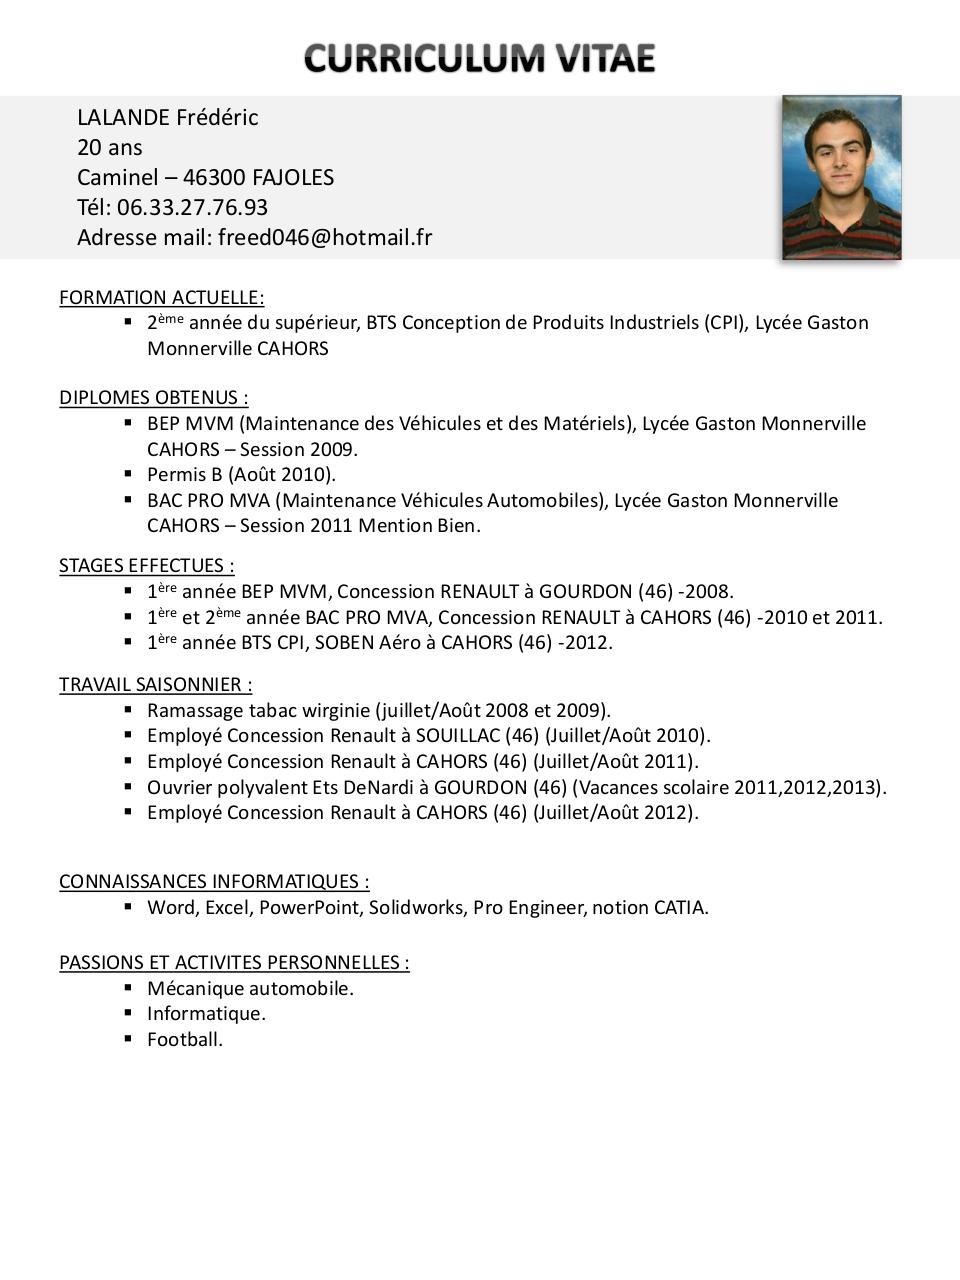 pr u00e9sentation powerpoint par fredo - cv pdf